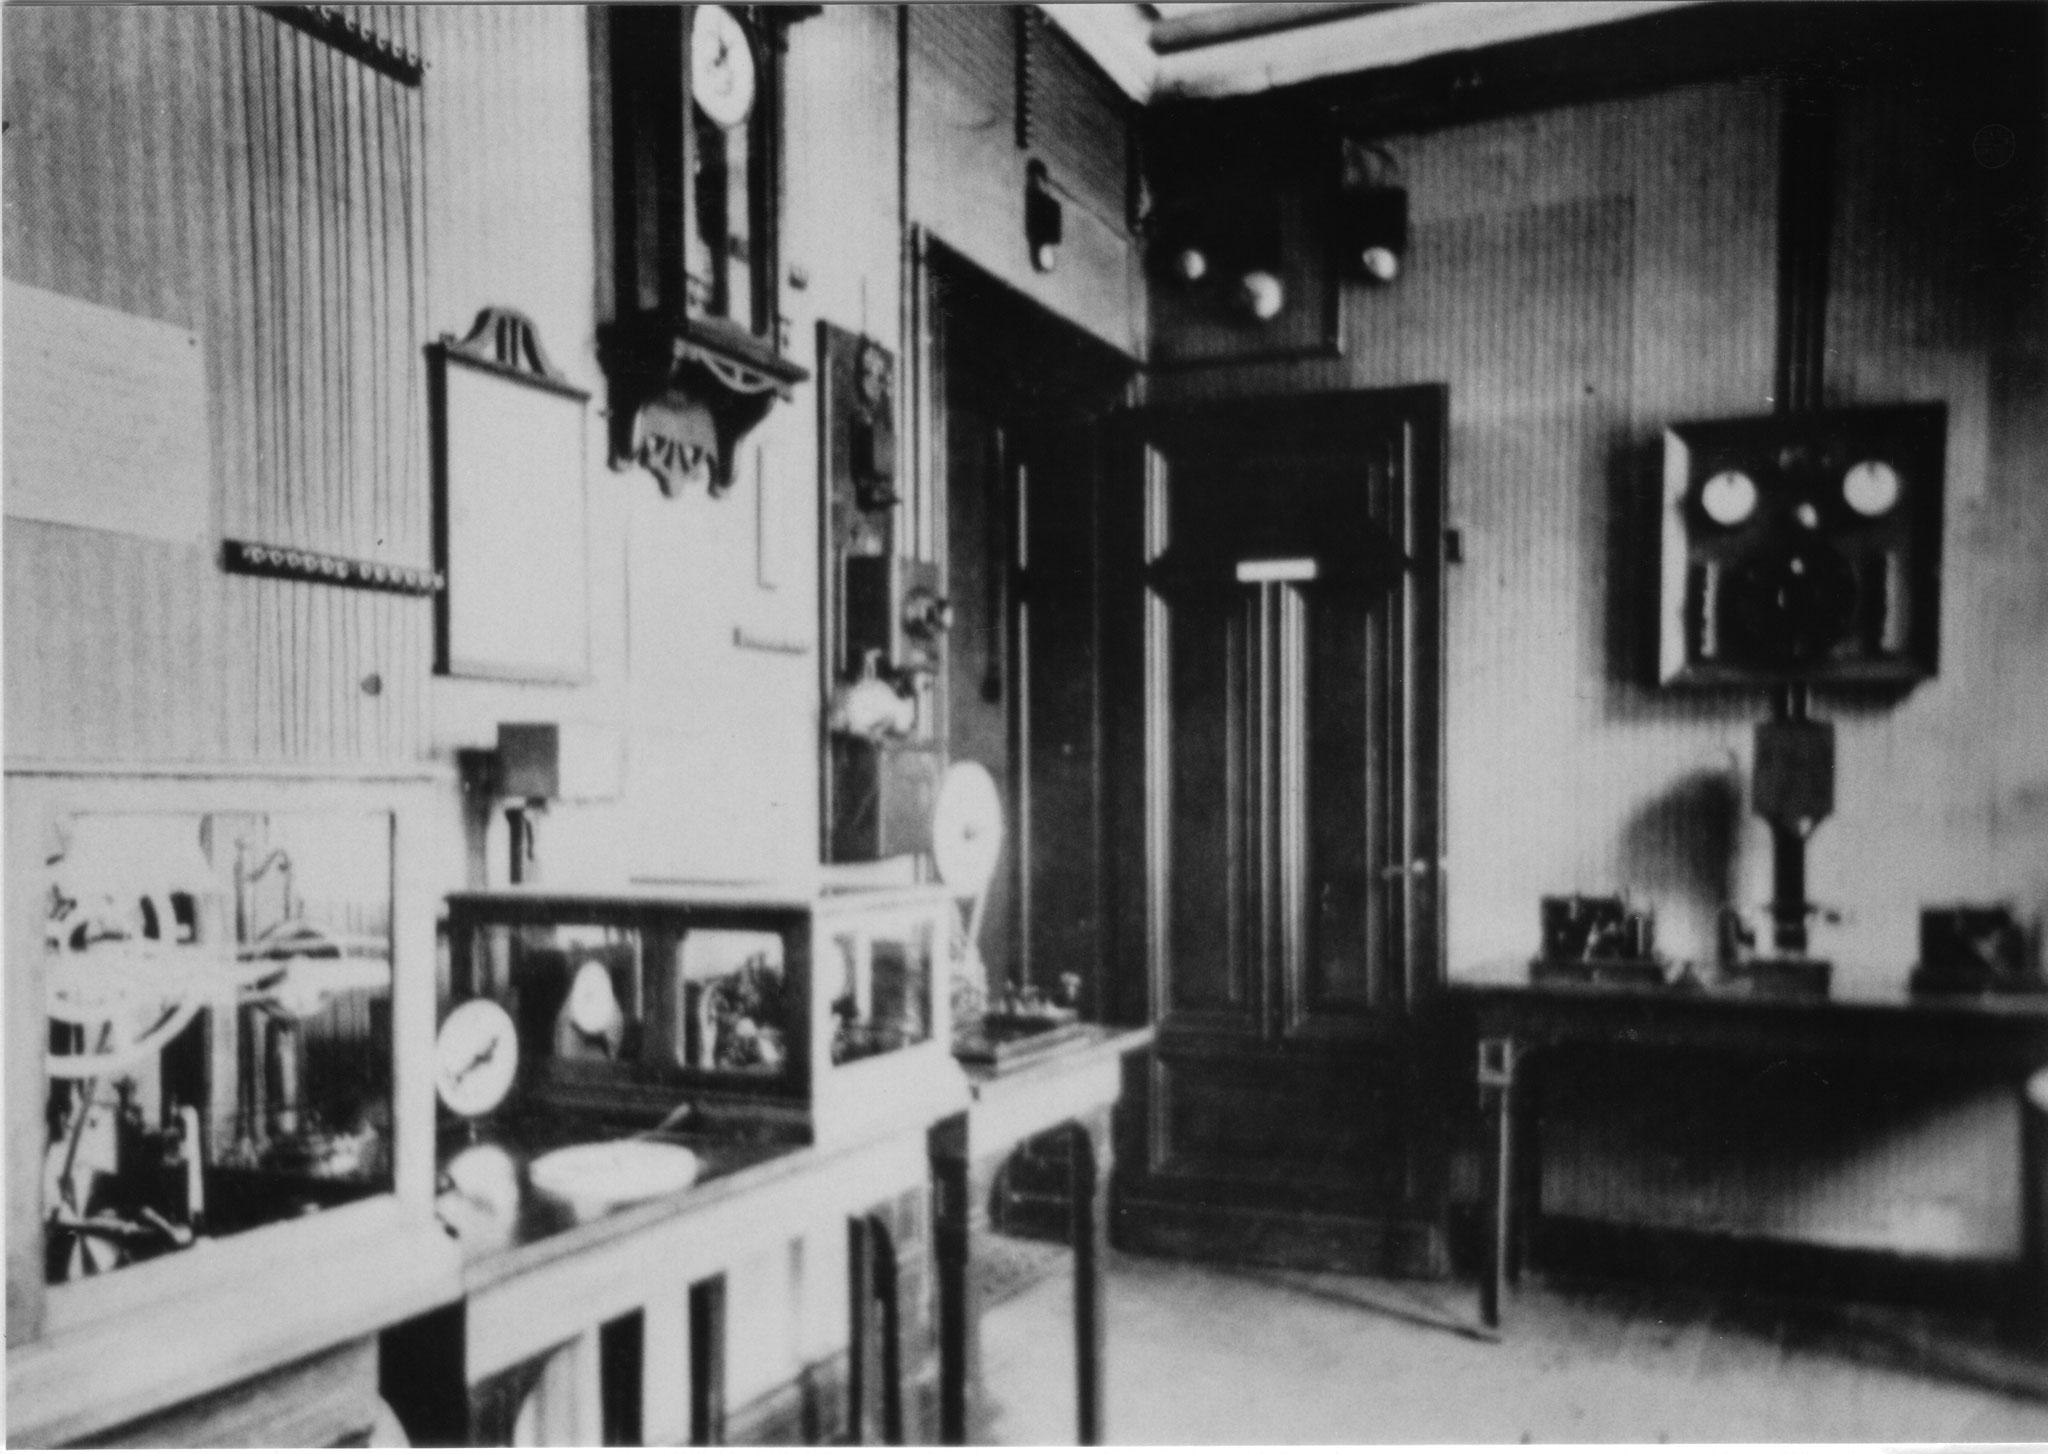 Rheinelbe Geräteraum